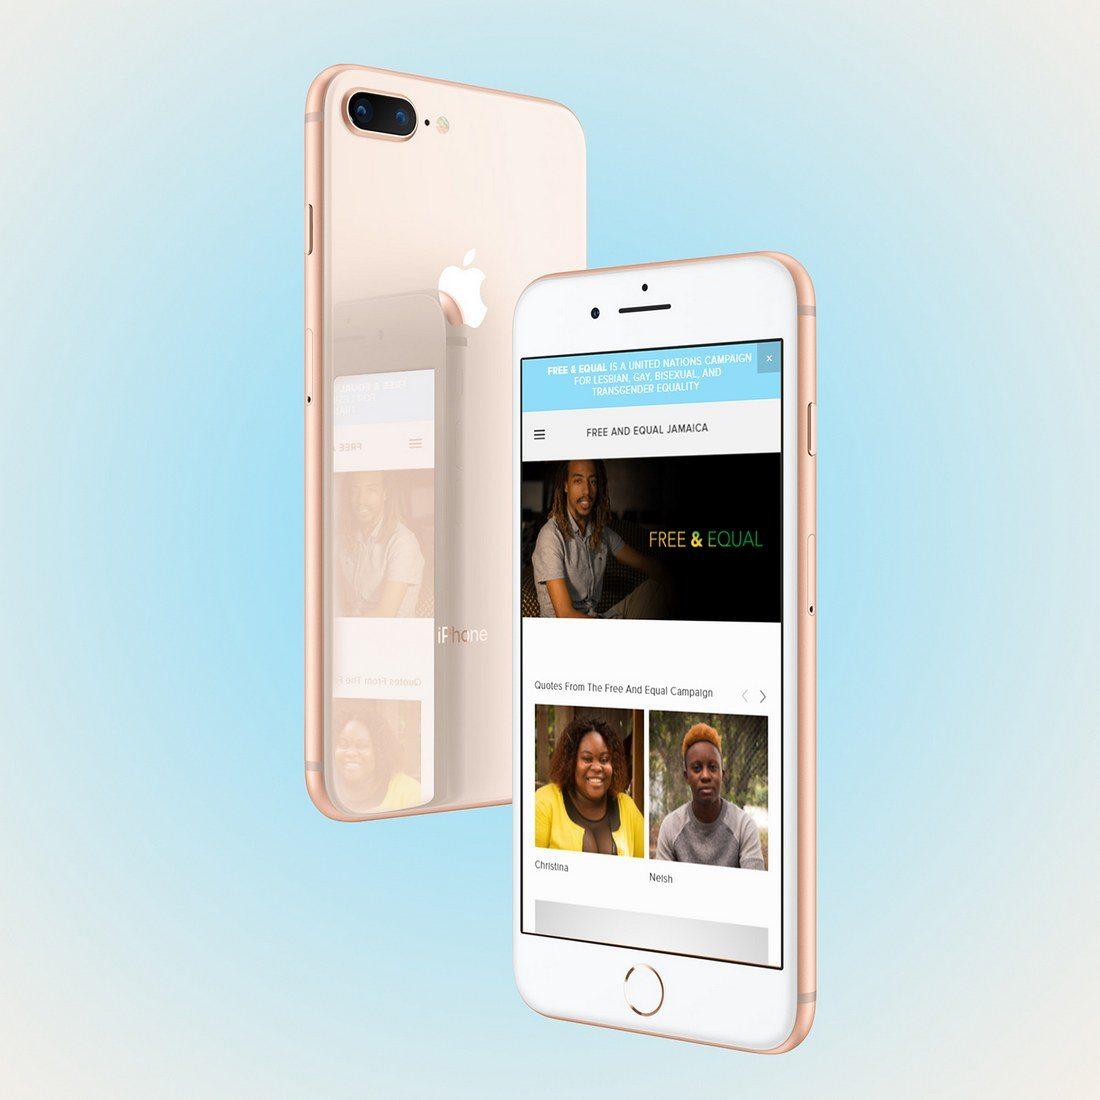 iPhone-8-Plus-screen-showcase-Mockup 20+ Best iPhone 8 Mockups design tips